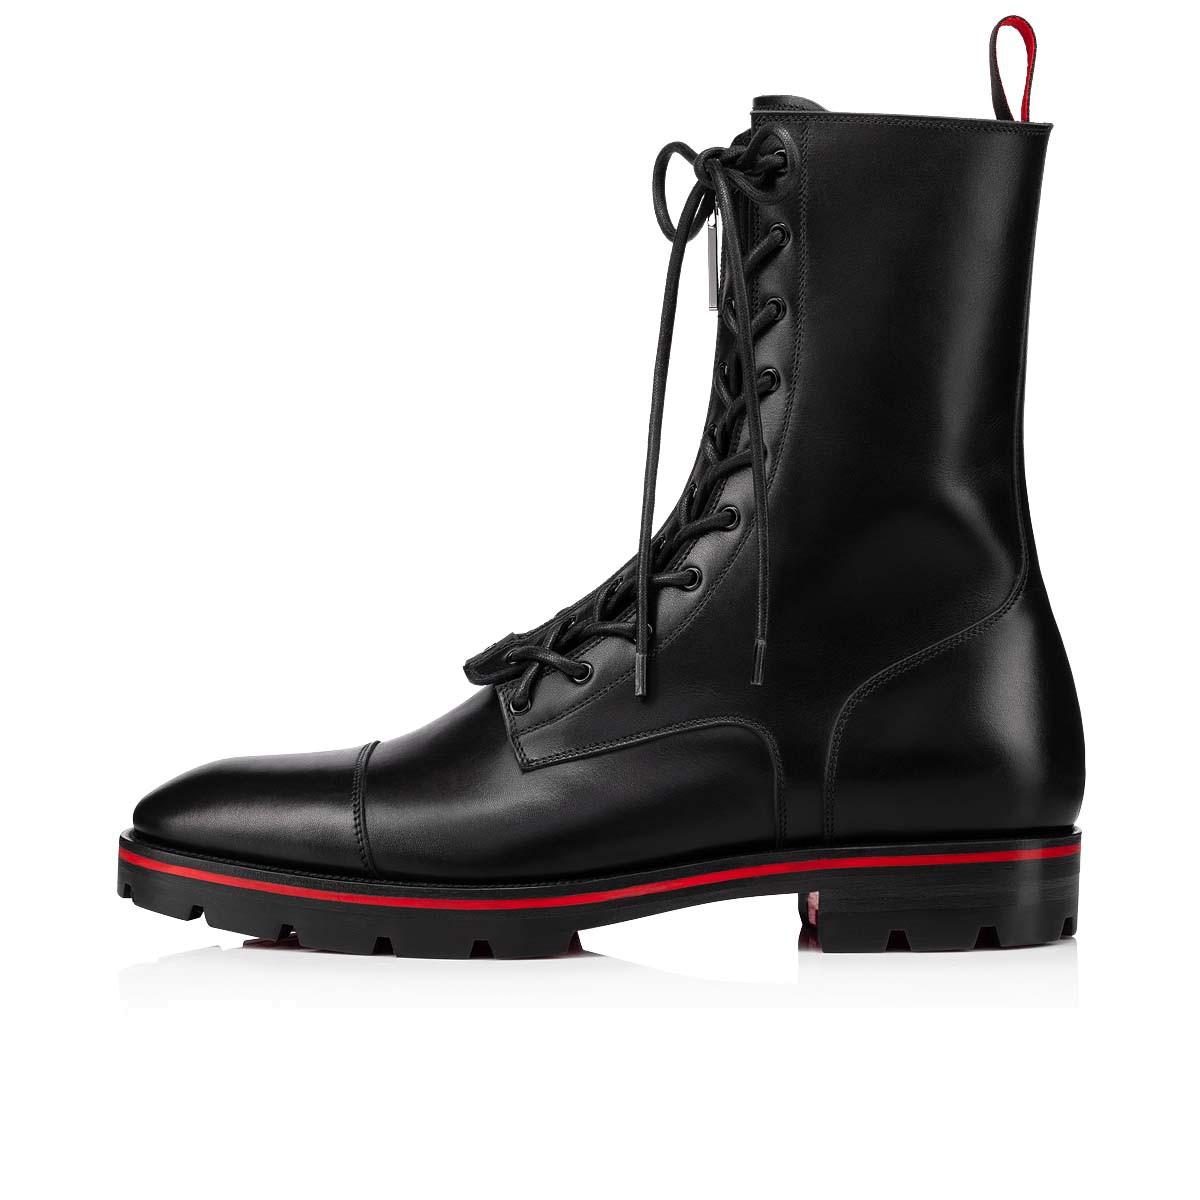 Shoes - Troopi Flat - Christian Louboutin